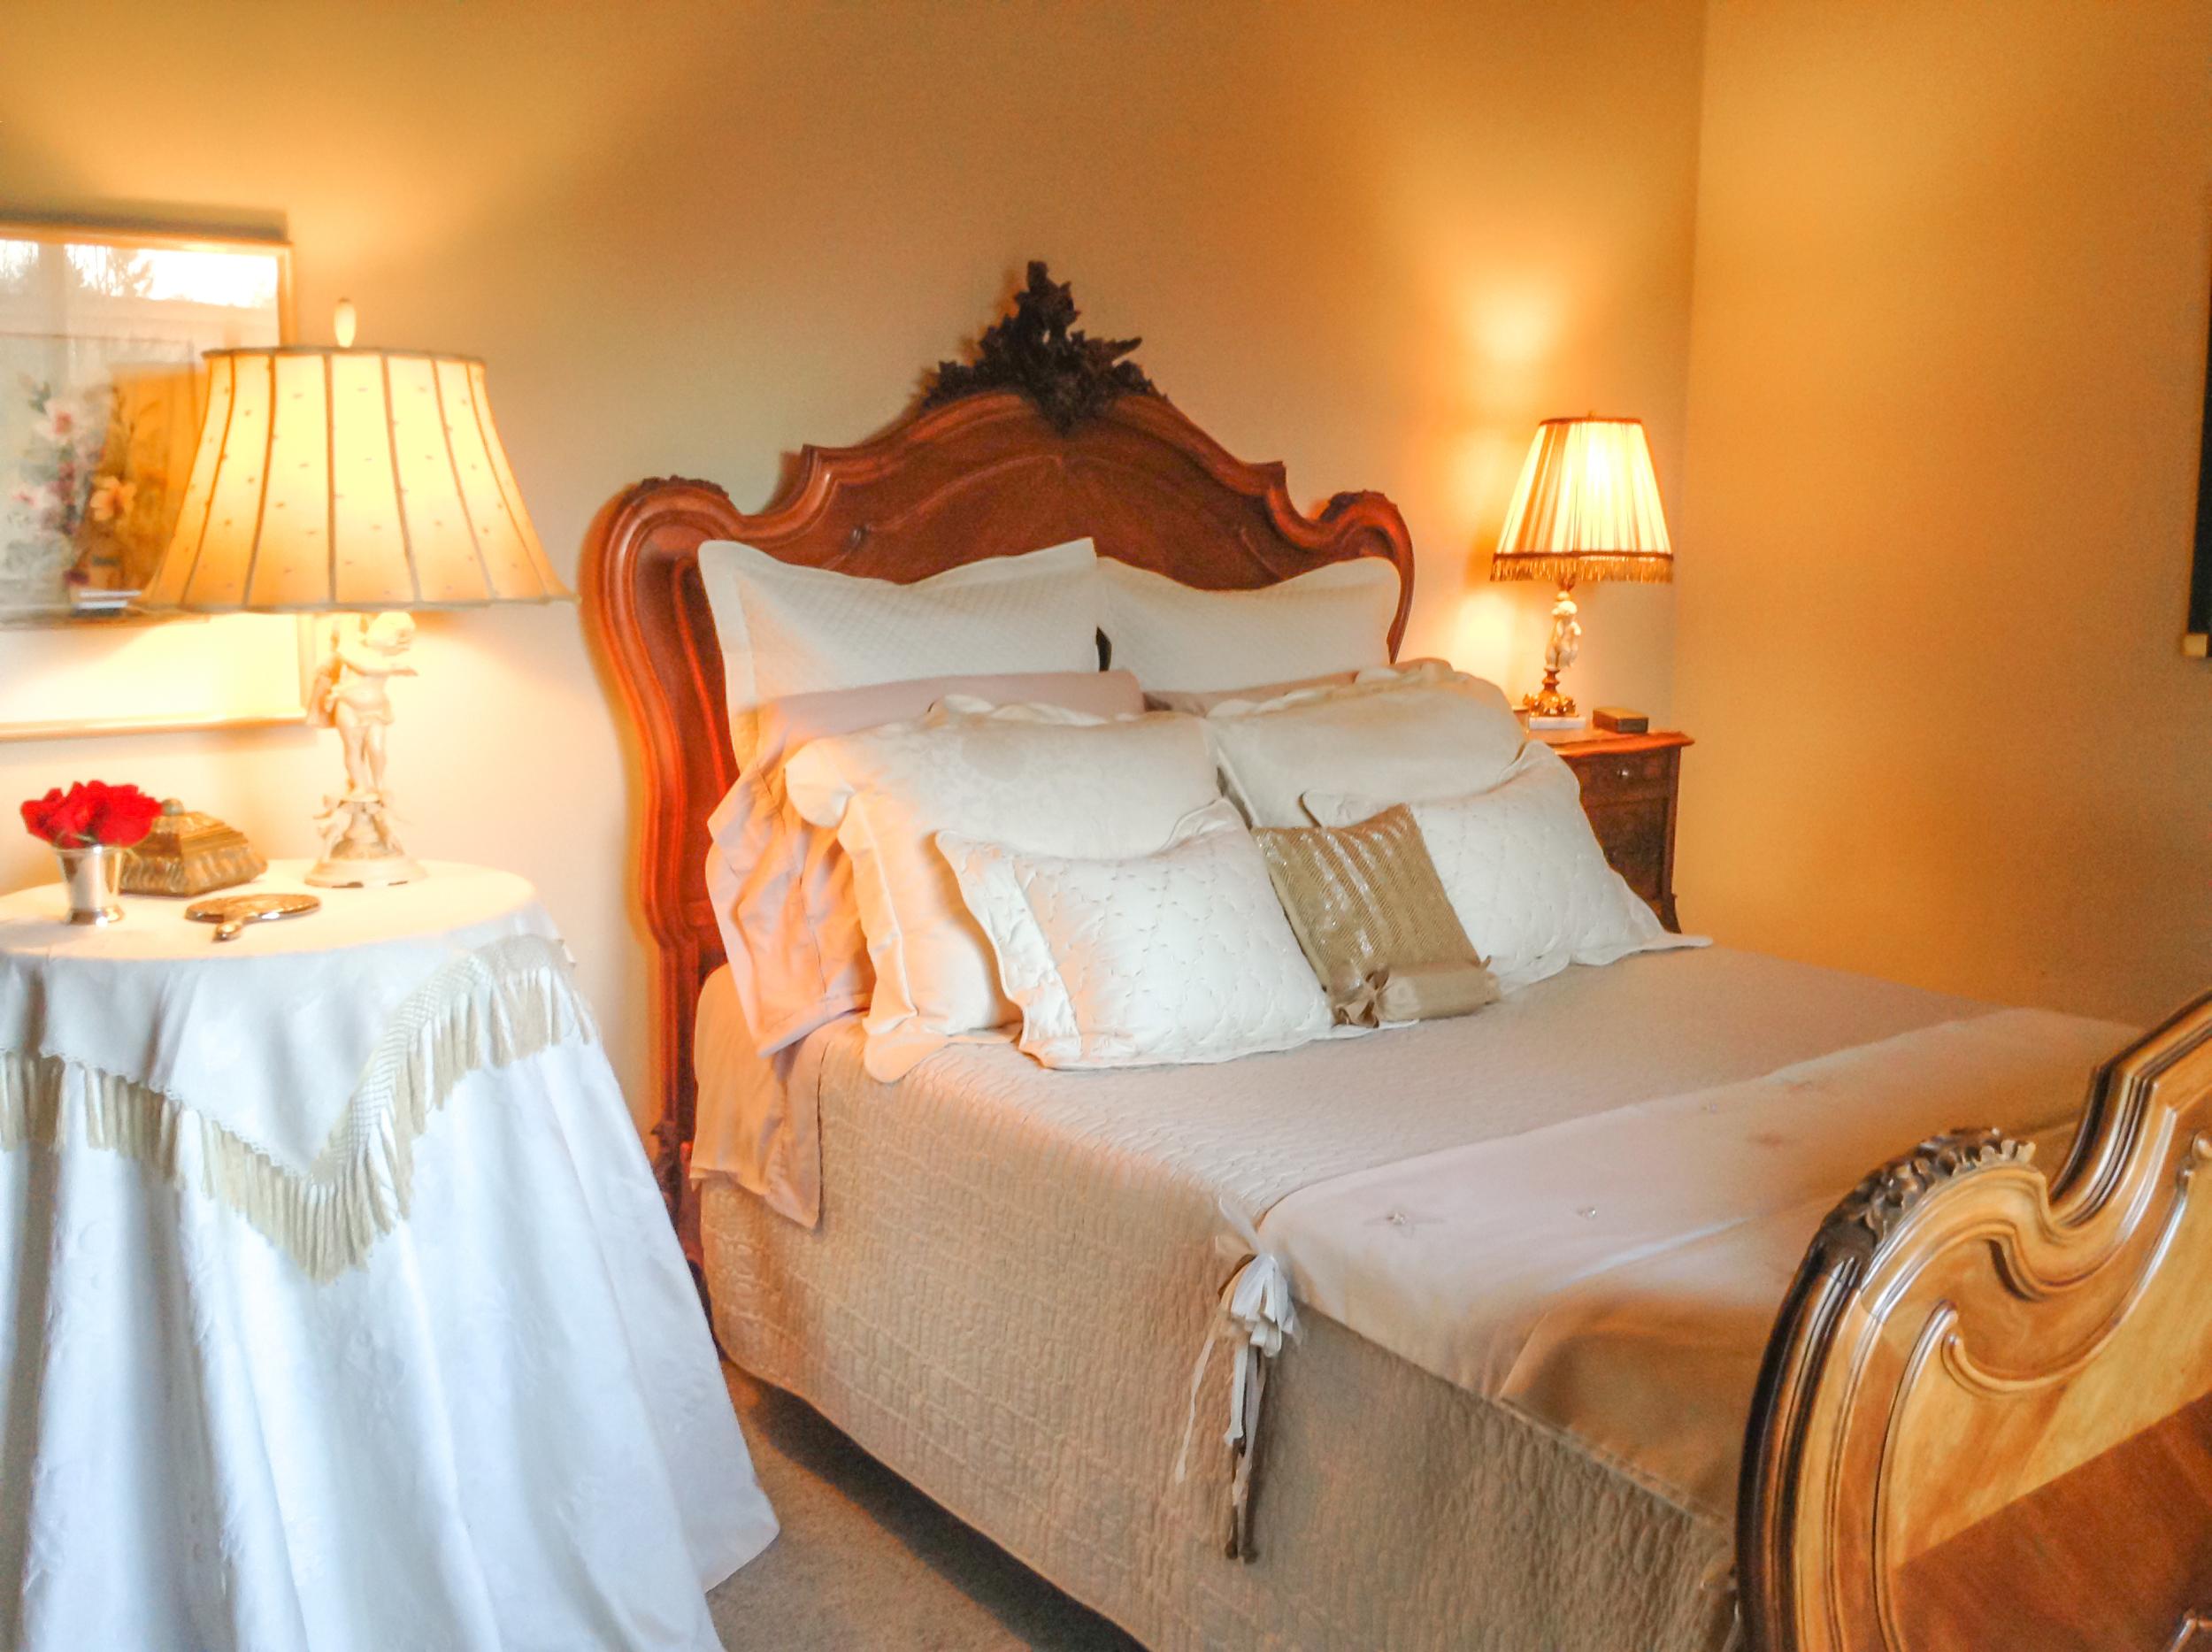 Bedroom3-KJ.jpg